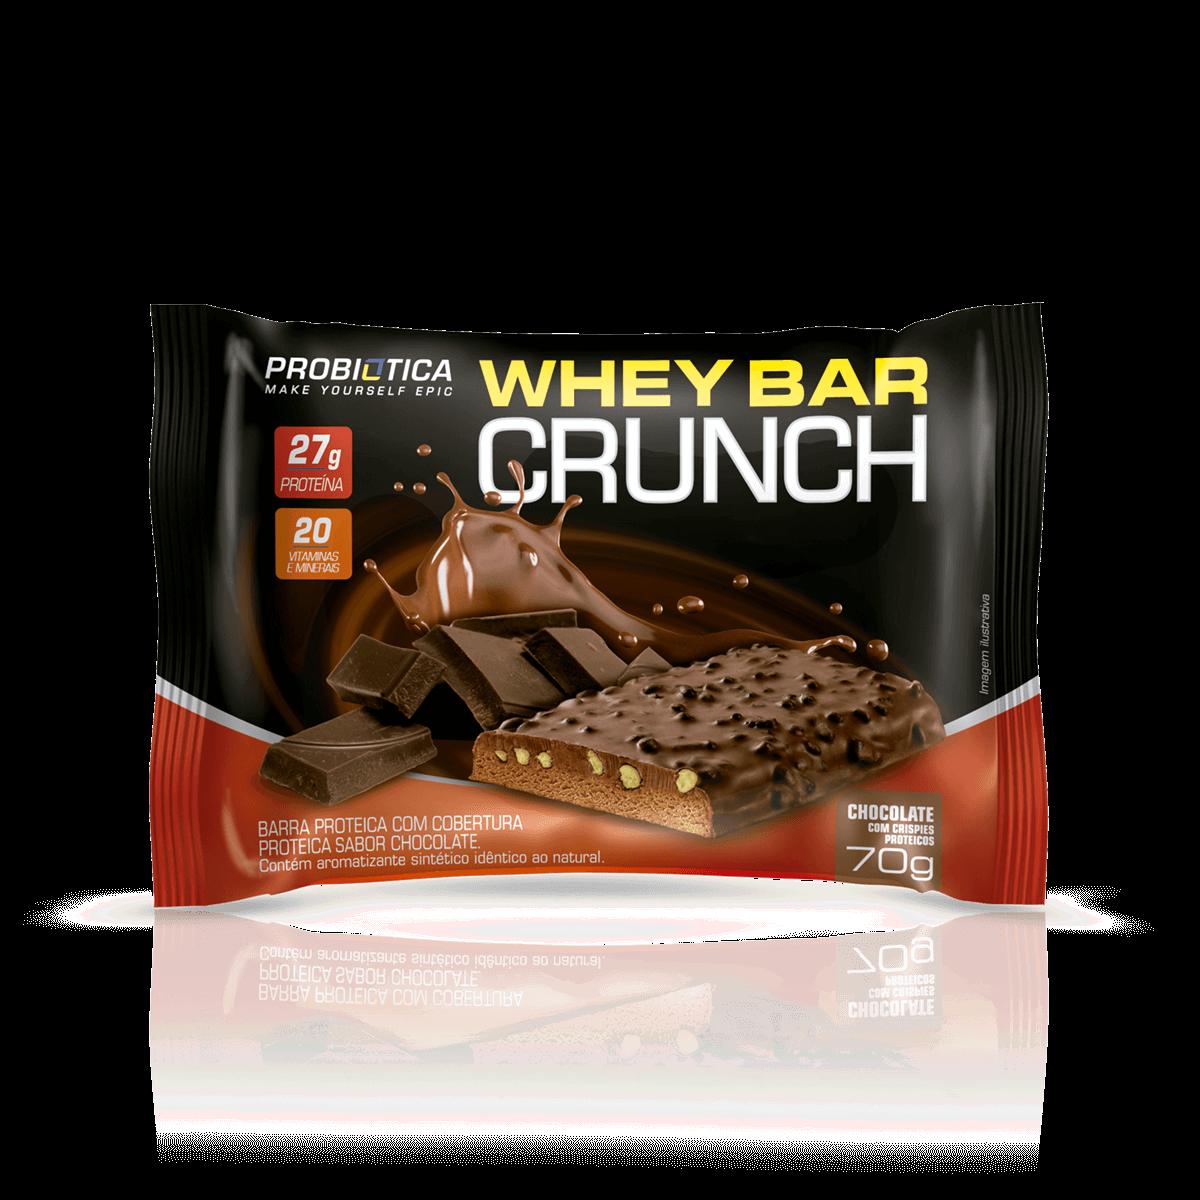 62c4d0688 Whey Bar Crunch Probiótica - Loja do Suplemento